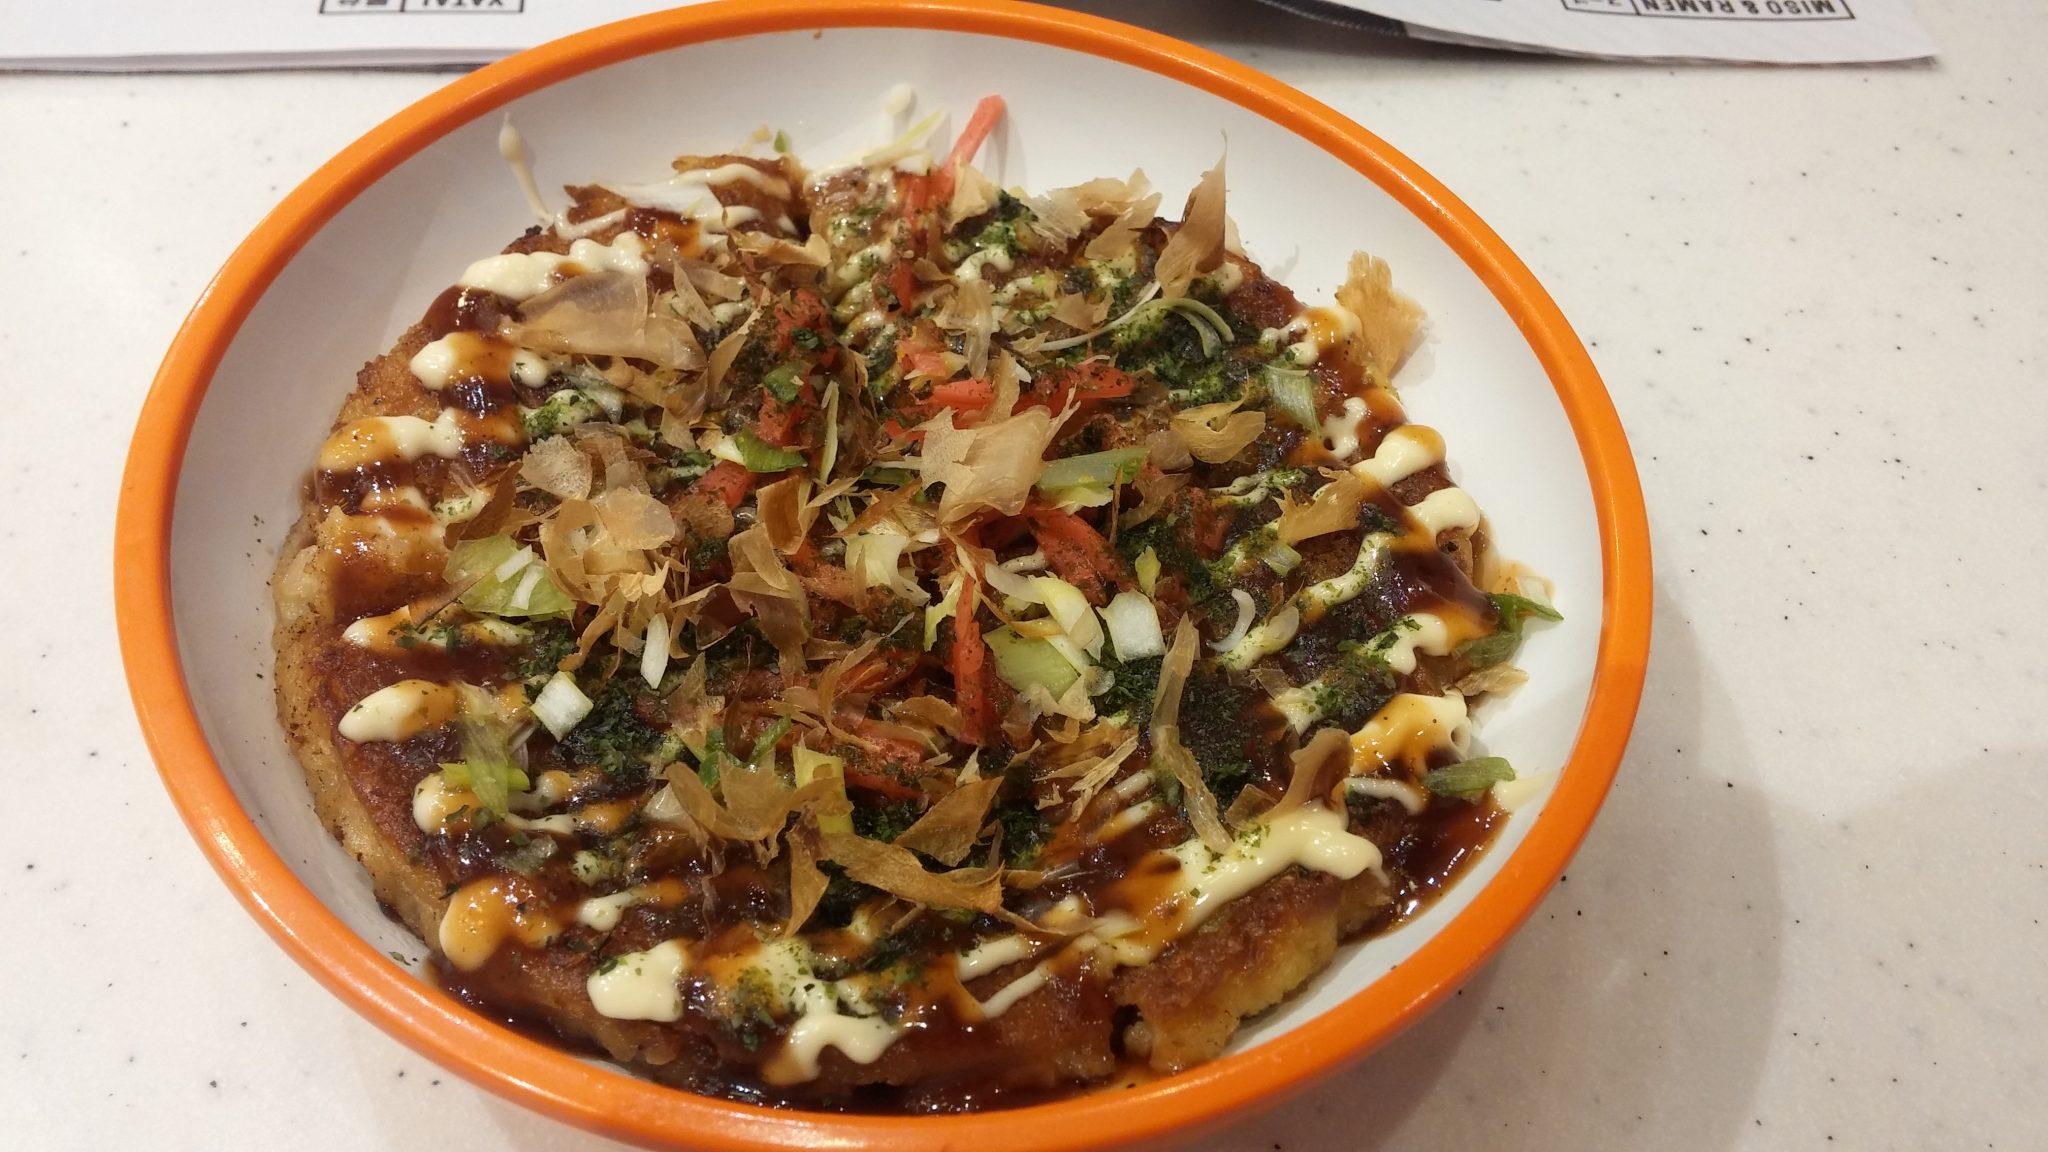 cabbage pancake topped with smoked bonito tuna flakes, katsu sauce, mayonnaise